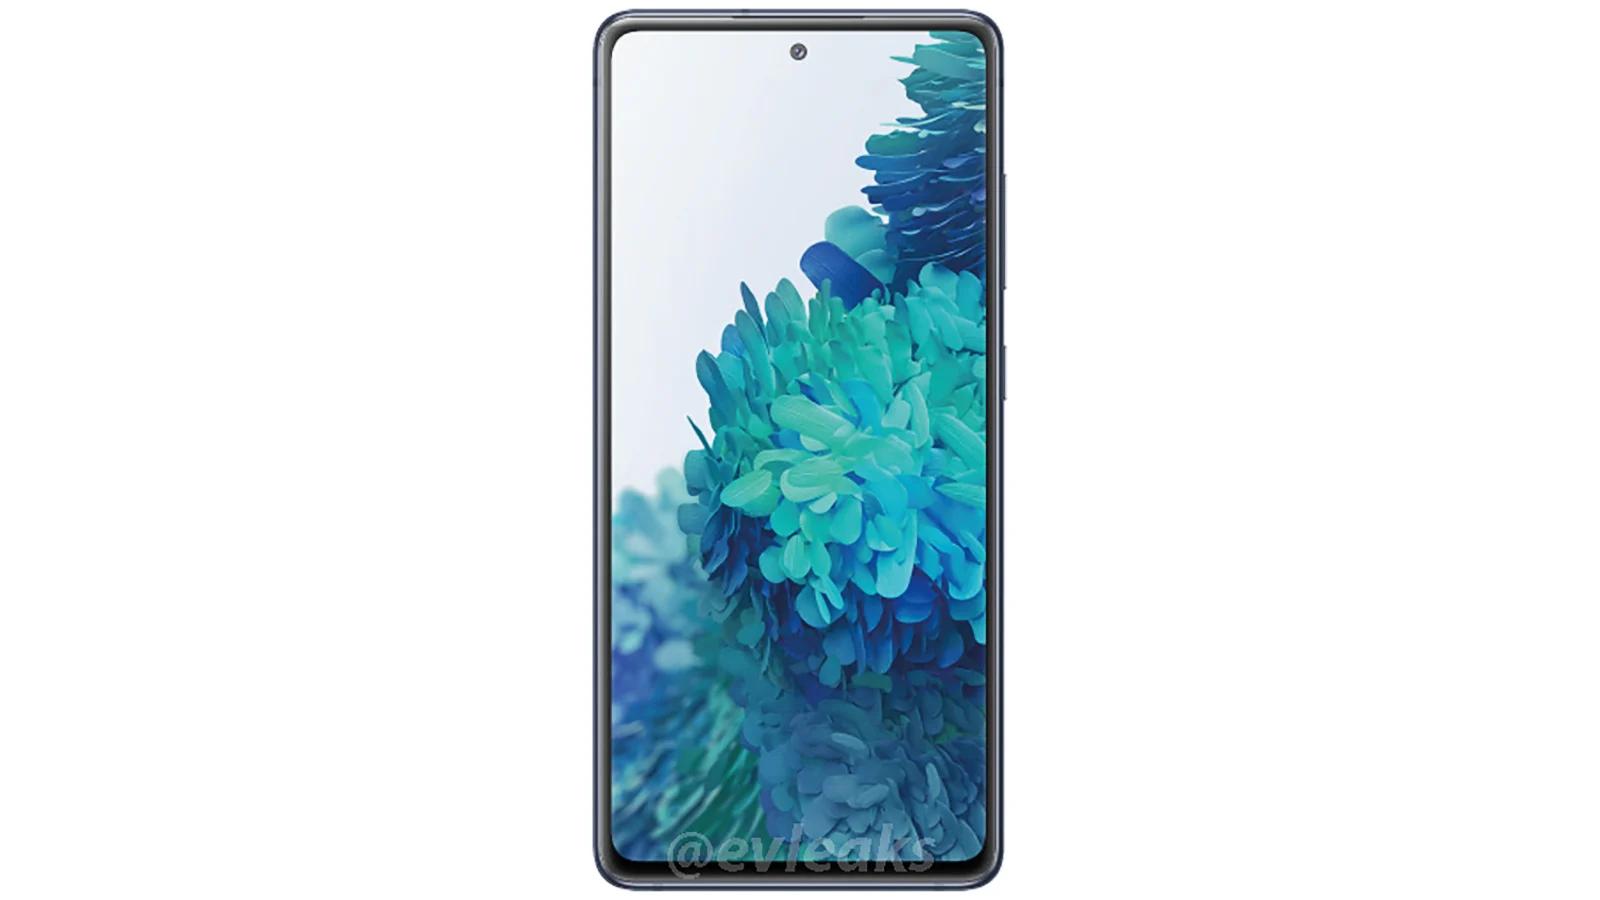 Samsung Galaxy S20 Fan Edition fica preso na imagem